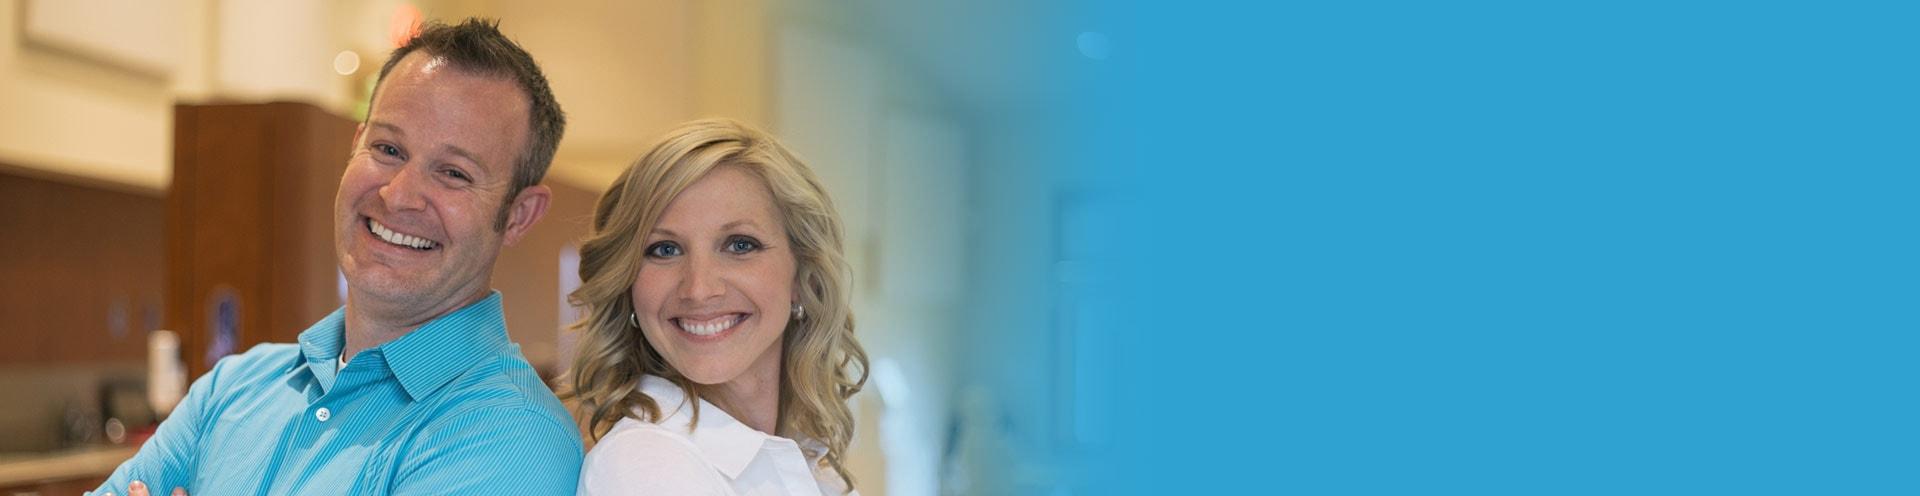 Our Orthodontics Providers